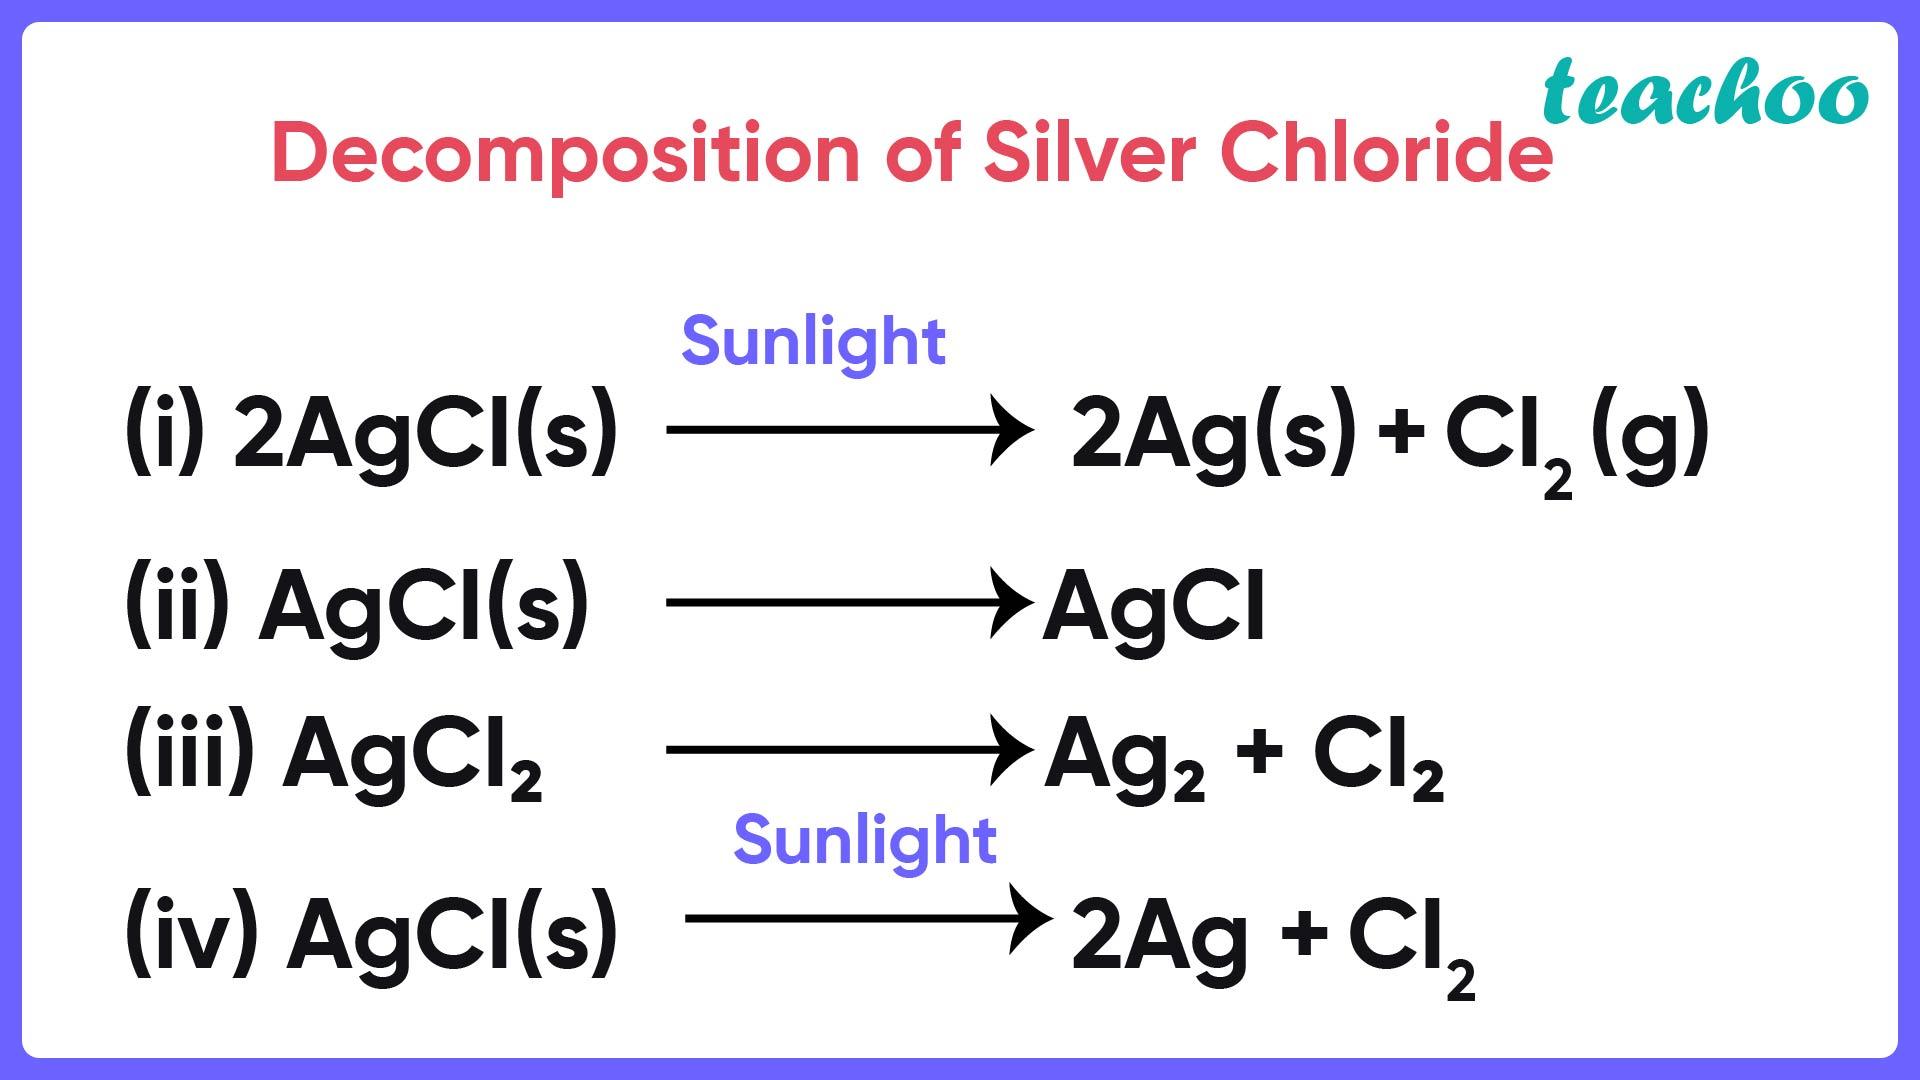 Decomposition of Silver Chloride - Teachoo-01.jpg